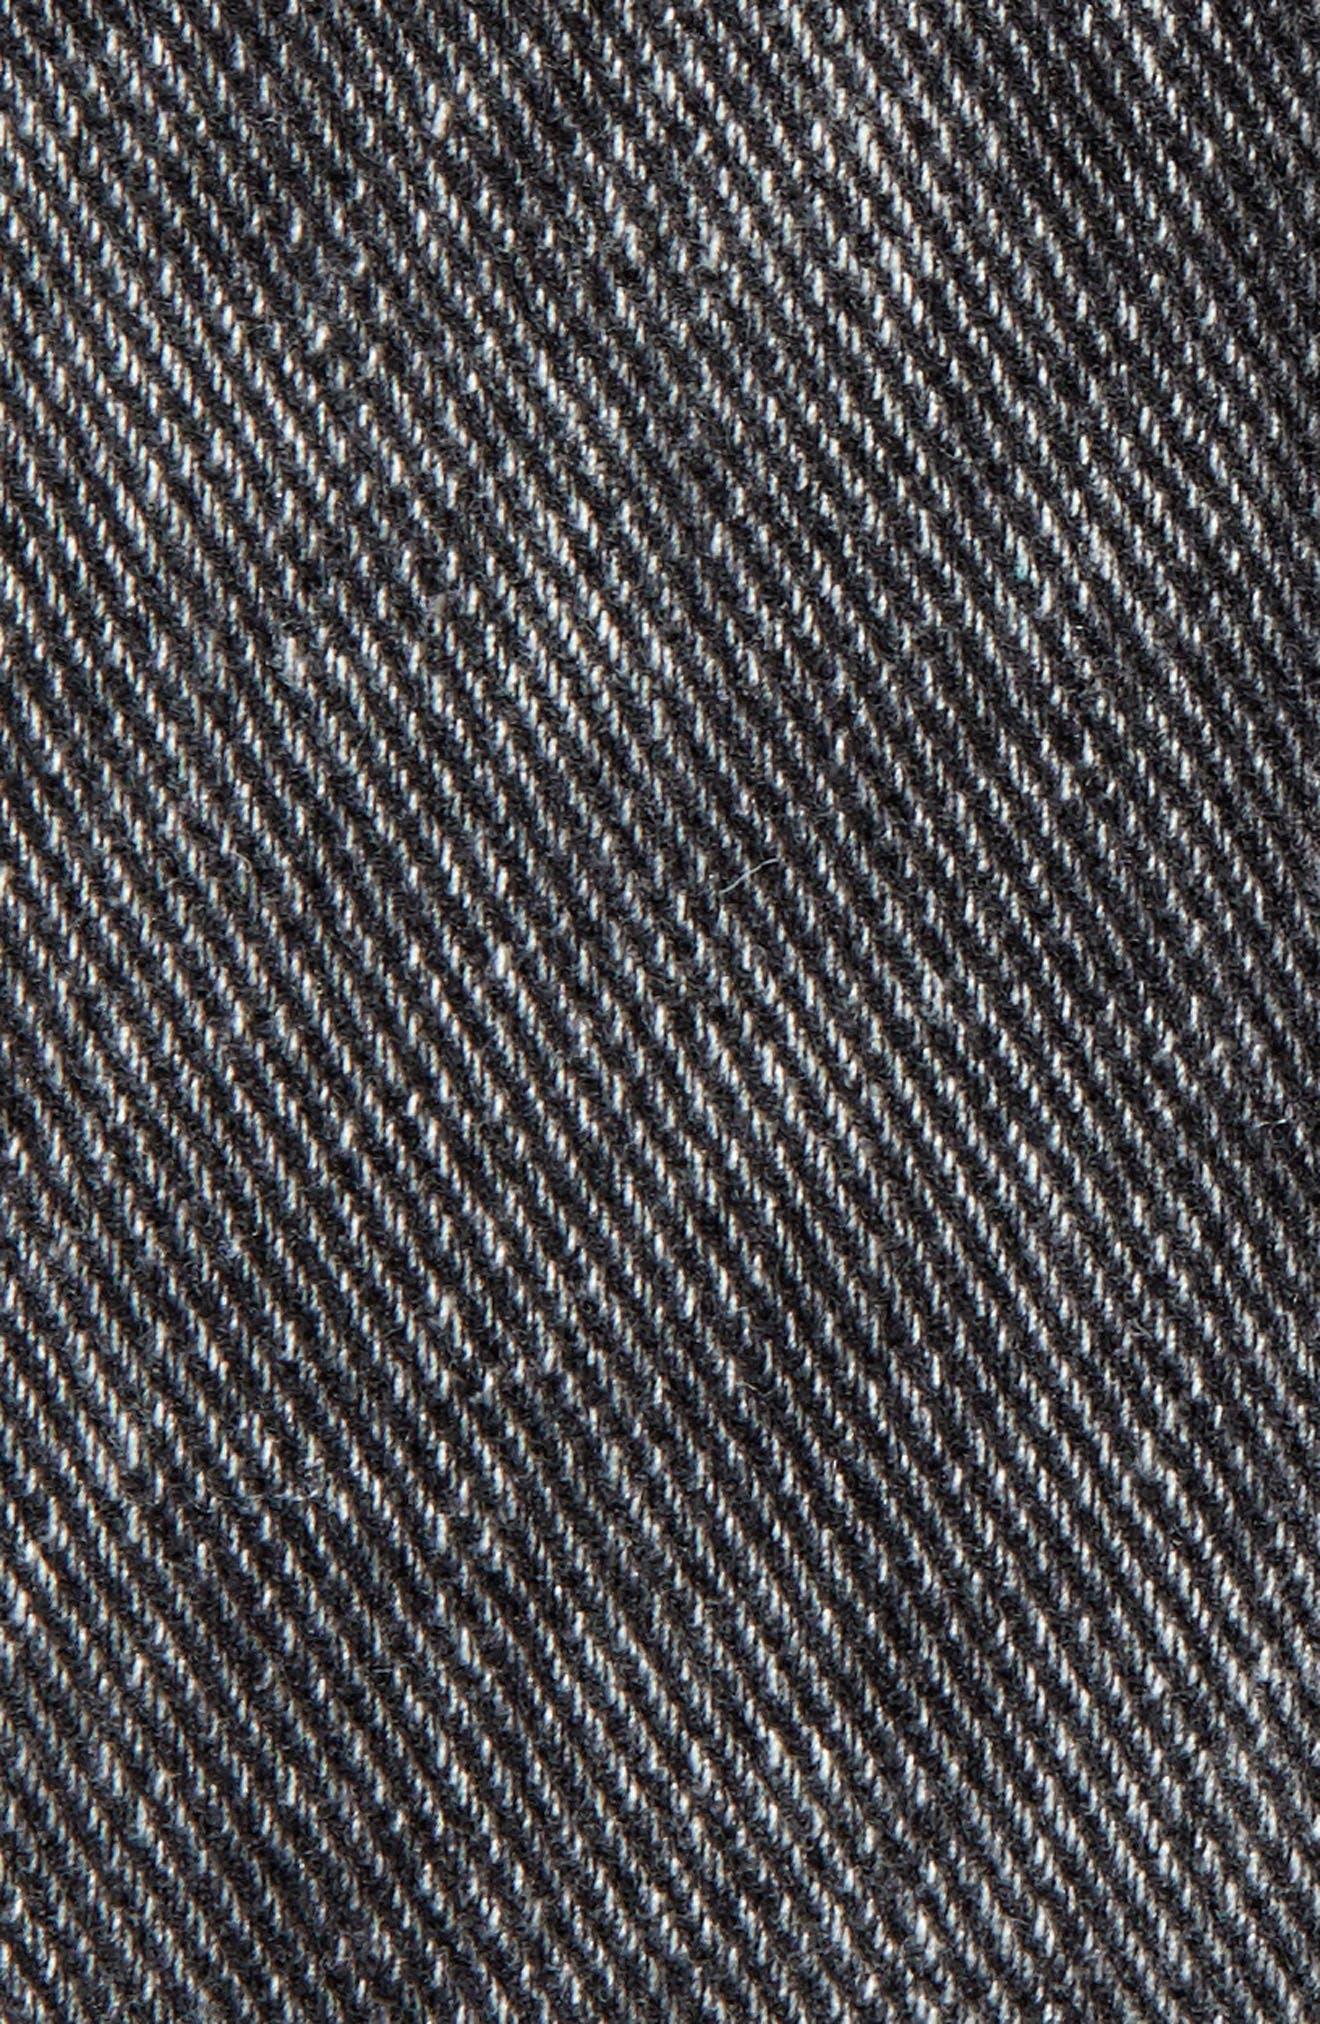 Classic Fit Denim Jacket,                             Alternate thumbnail 7, color,                             BLACK ACID WASH